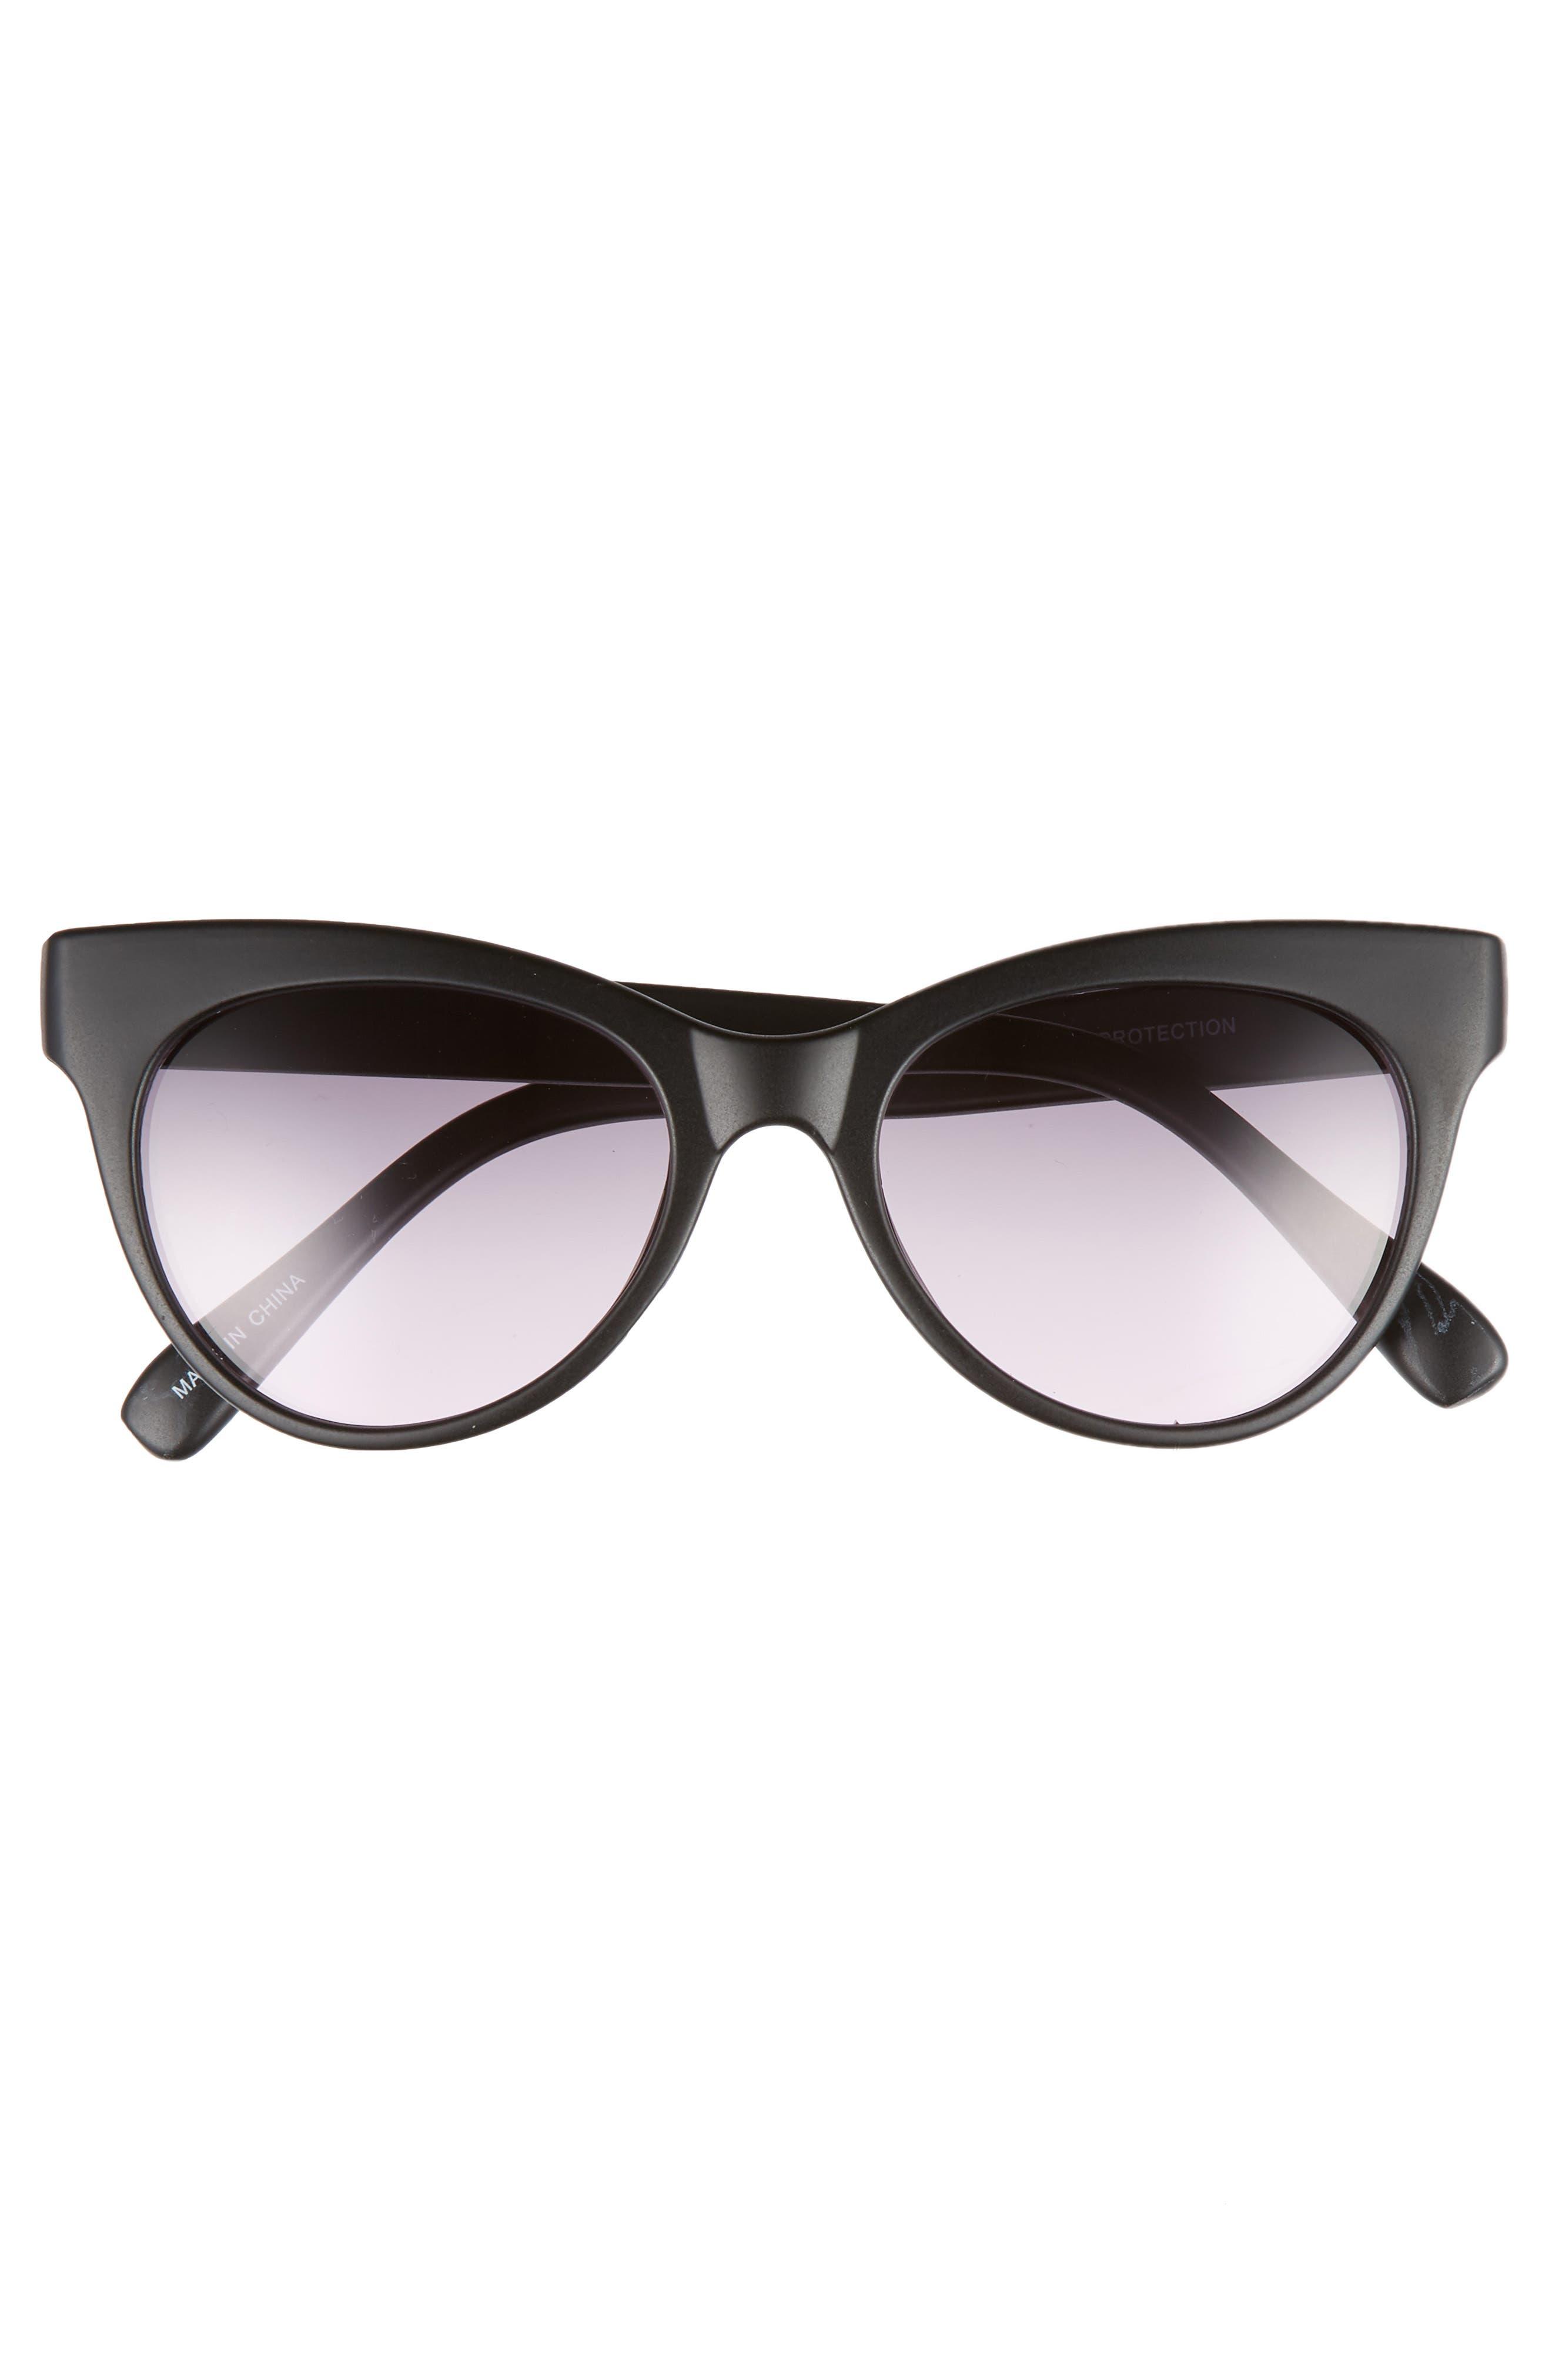 56mm Cat Eye Sunglasses,                             Alternate thumbnail 3, color,                             001